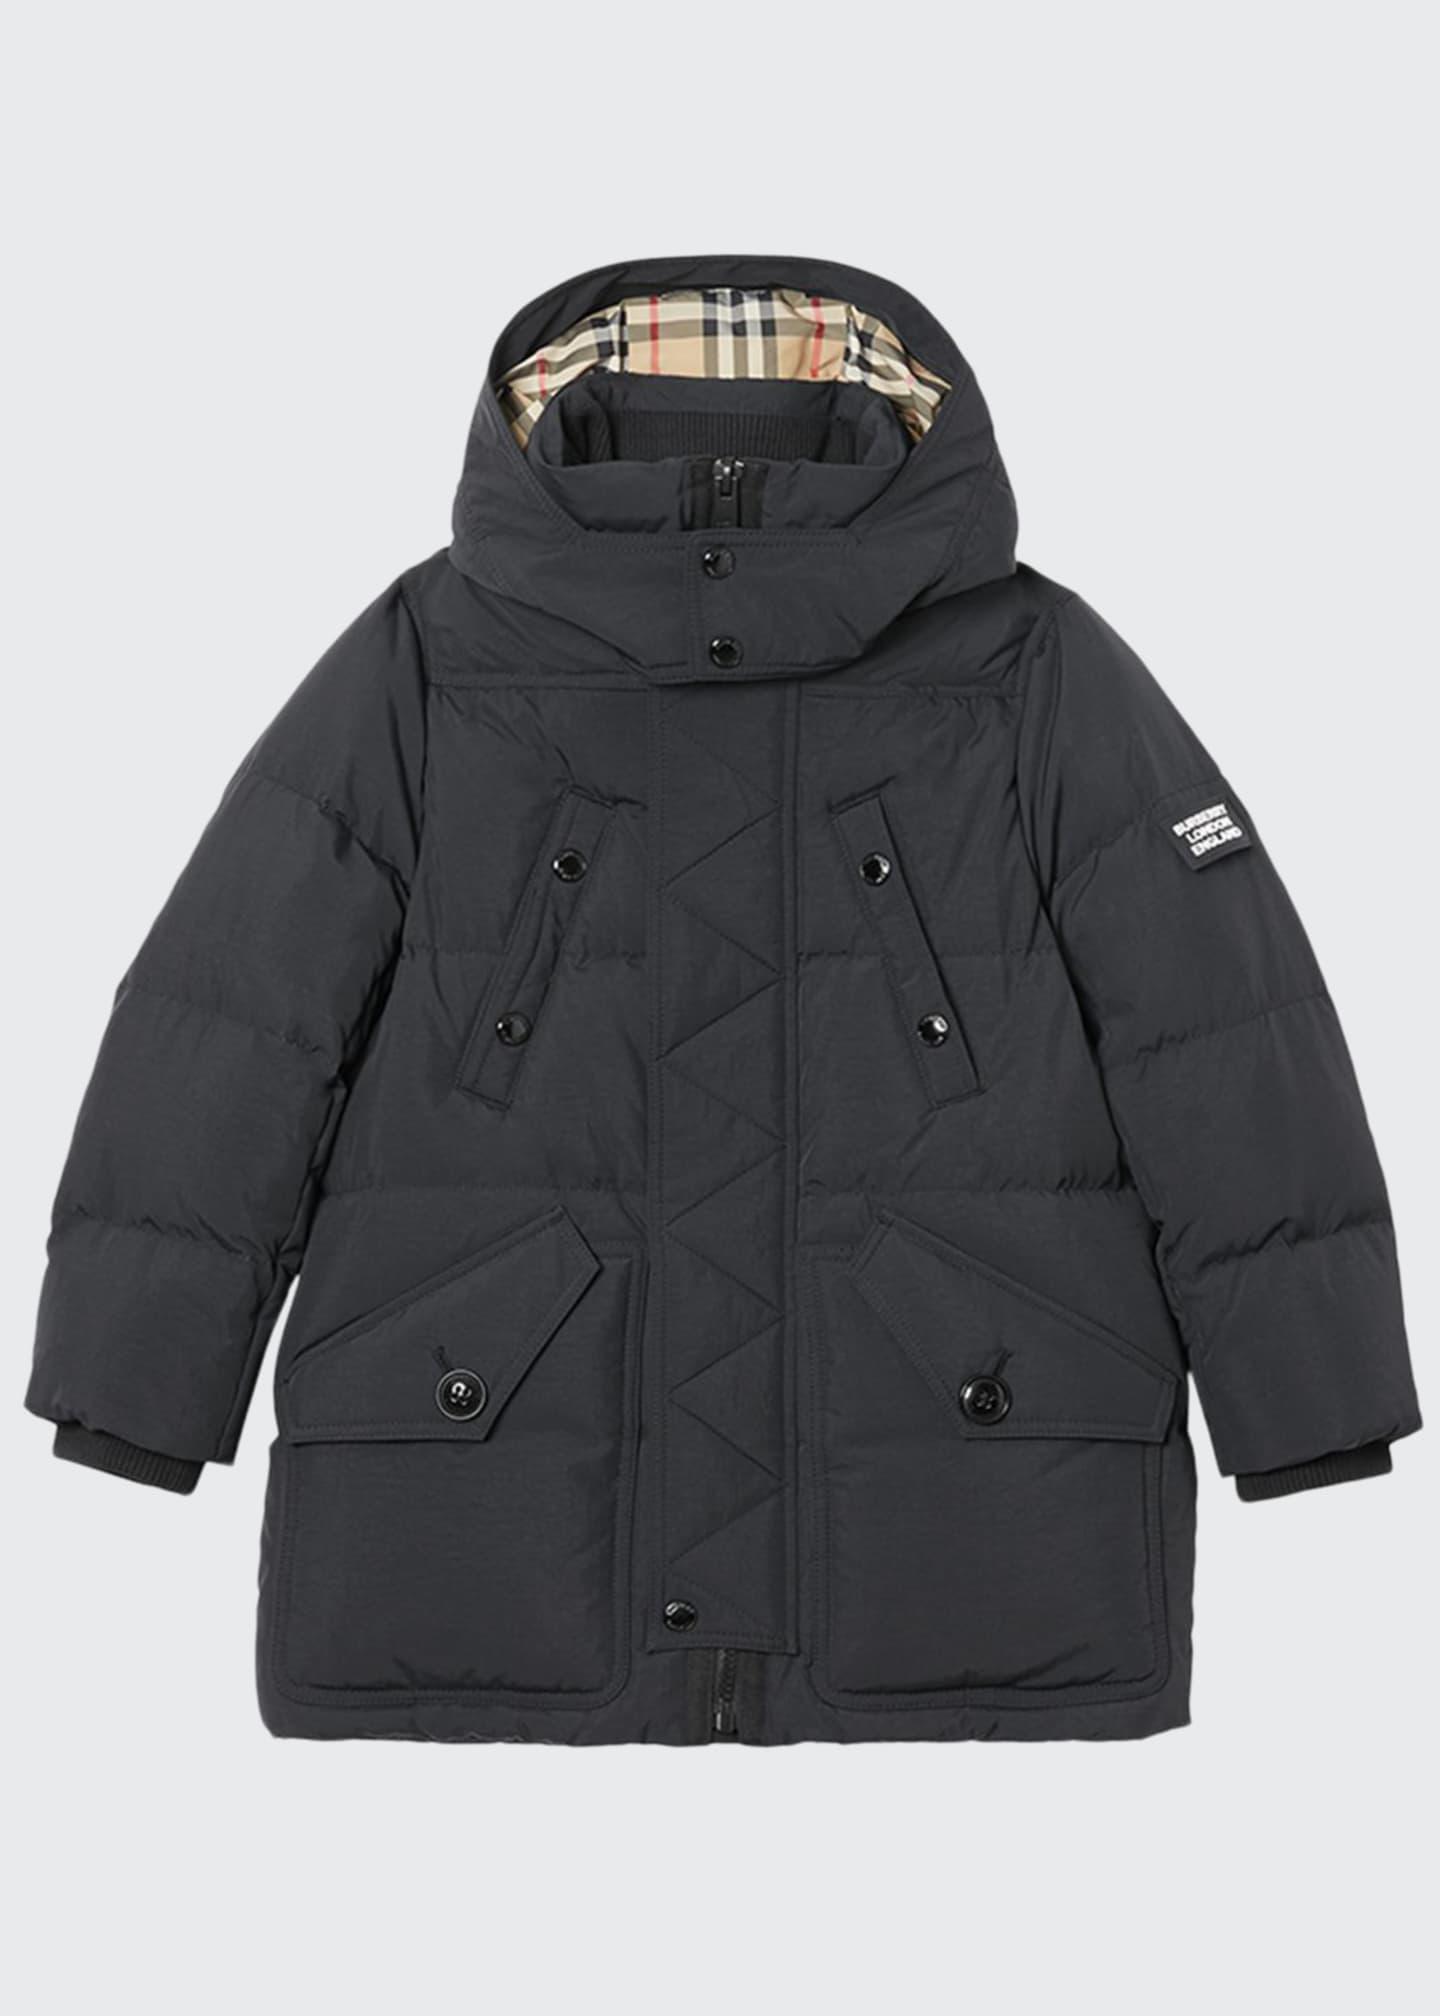 Burberry Boy's Ryker Puffer Parka Coat, Size 3-14